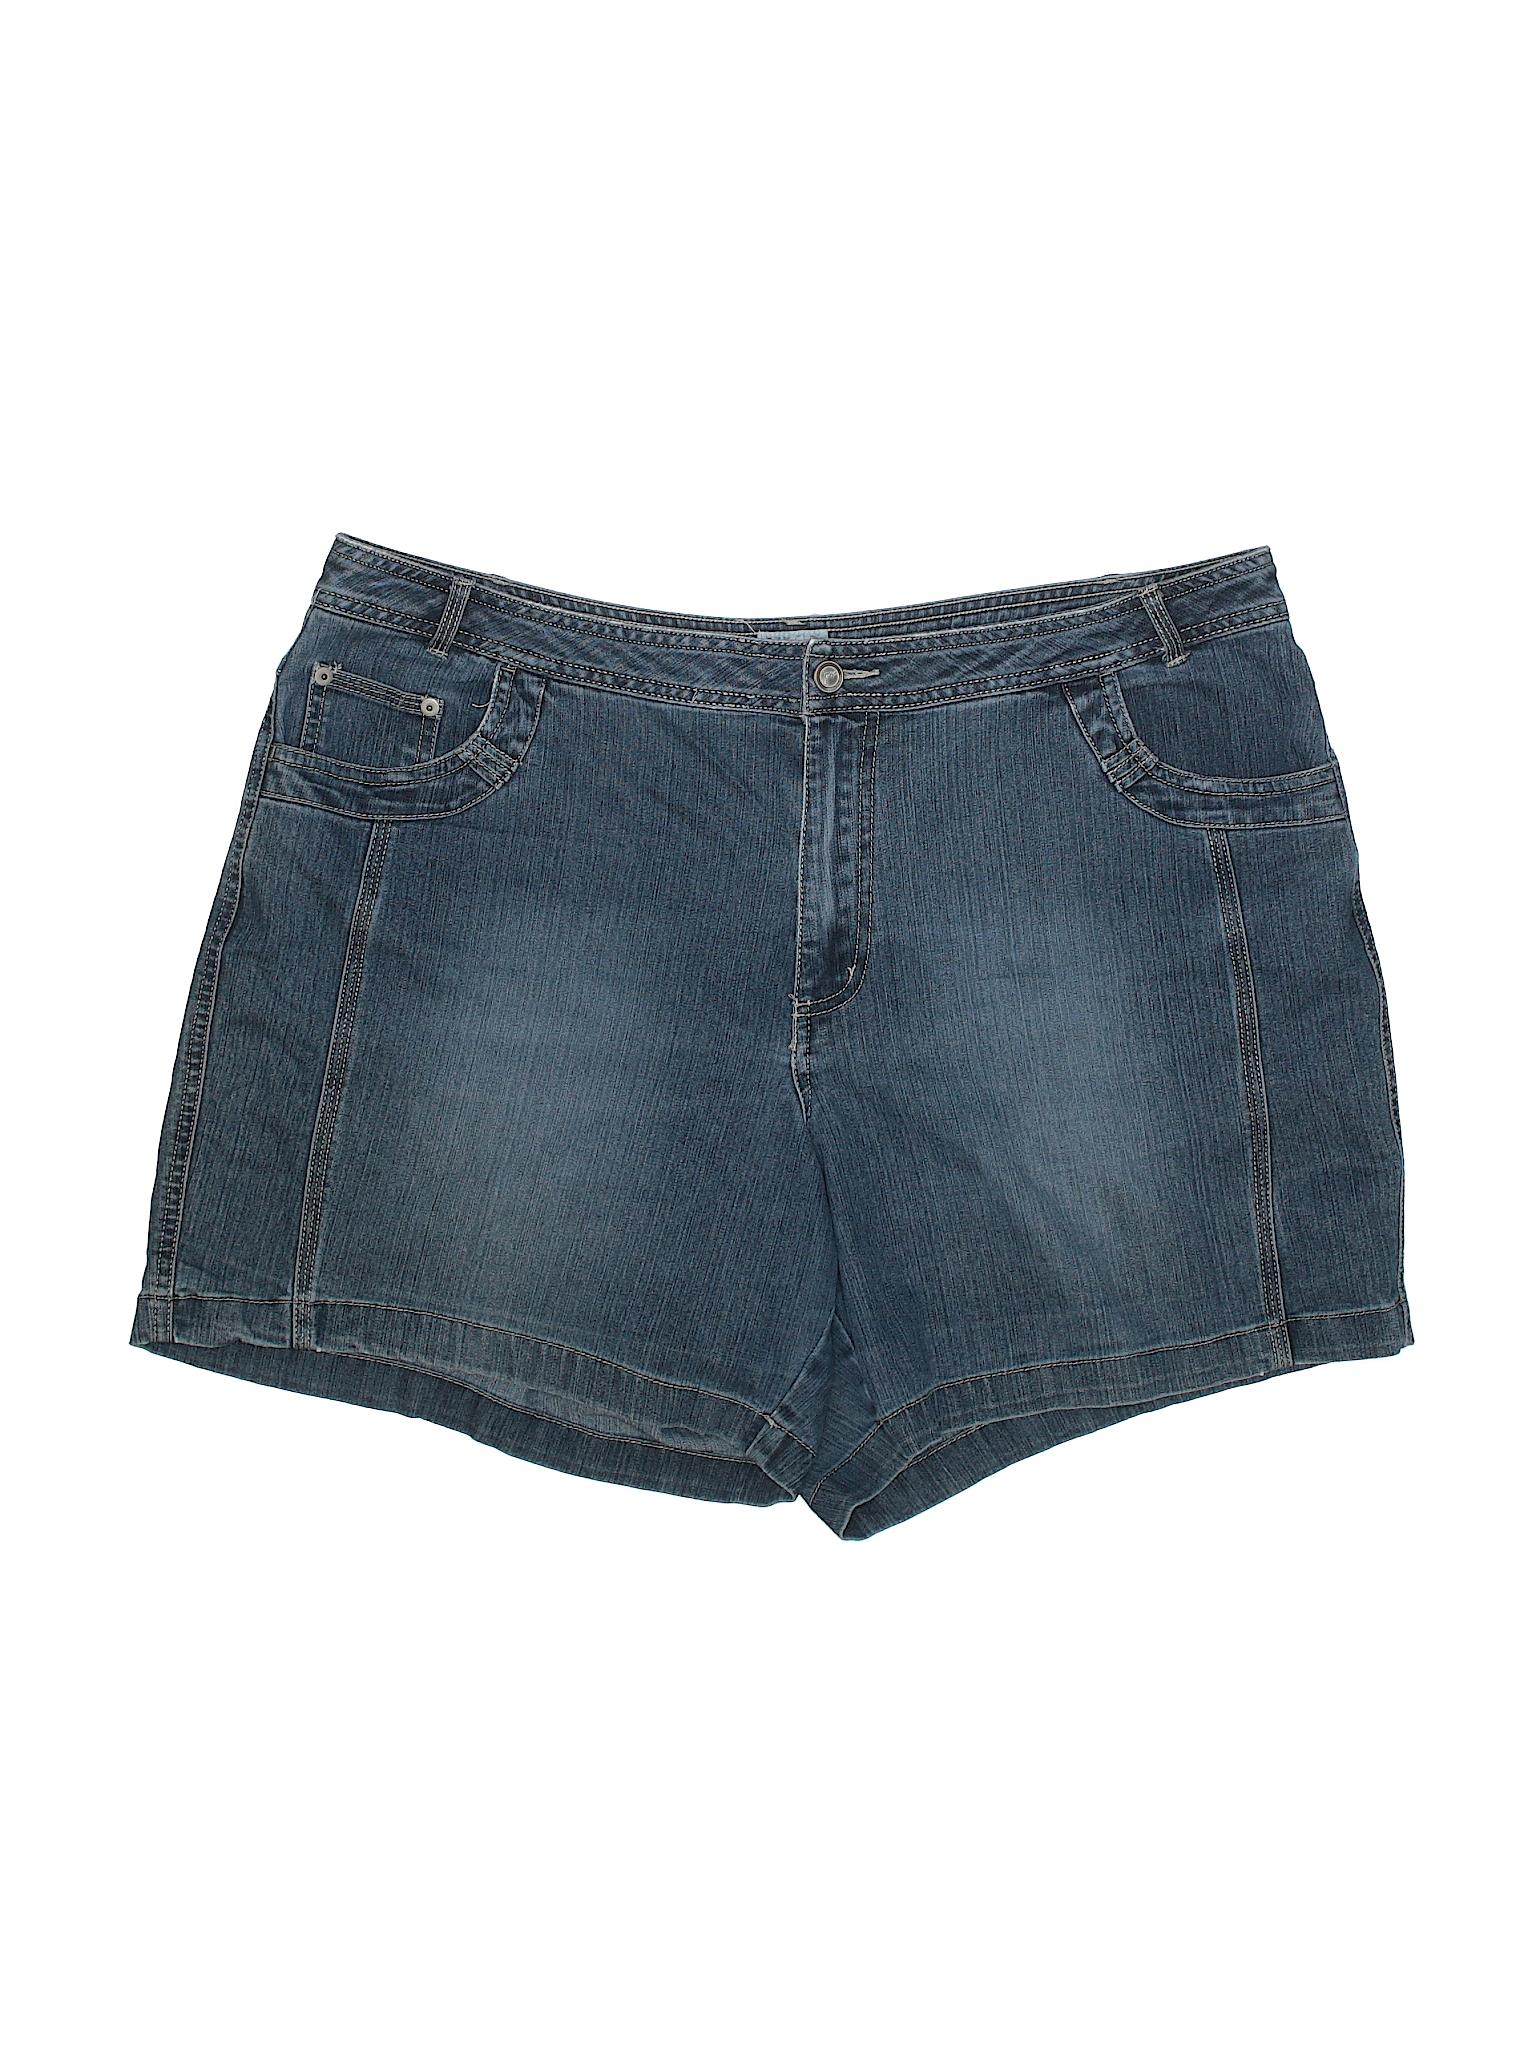 6b54095d35f Just My Size Solid Blue Denim Shorts Size 18W Plus (Plus) - 66% off ...